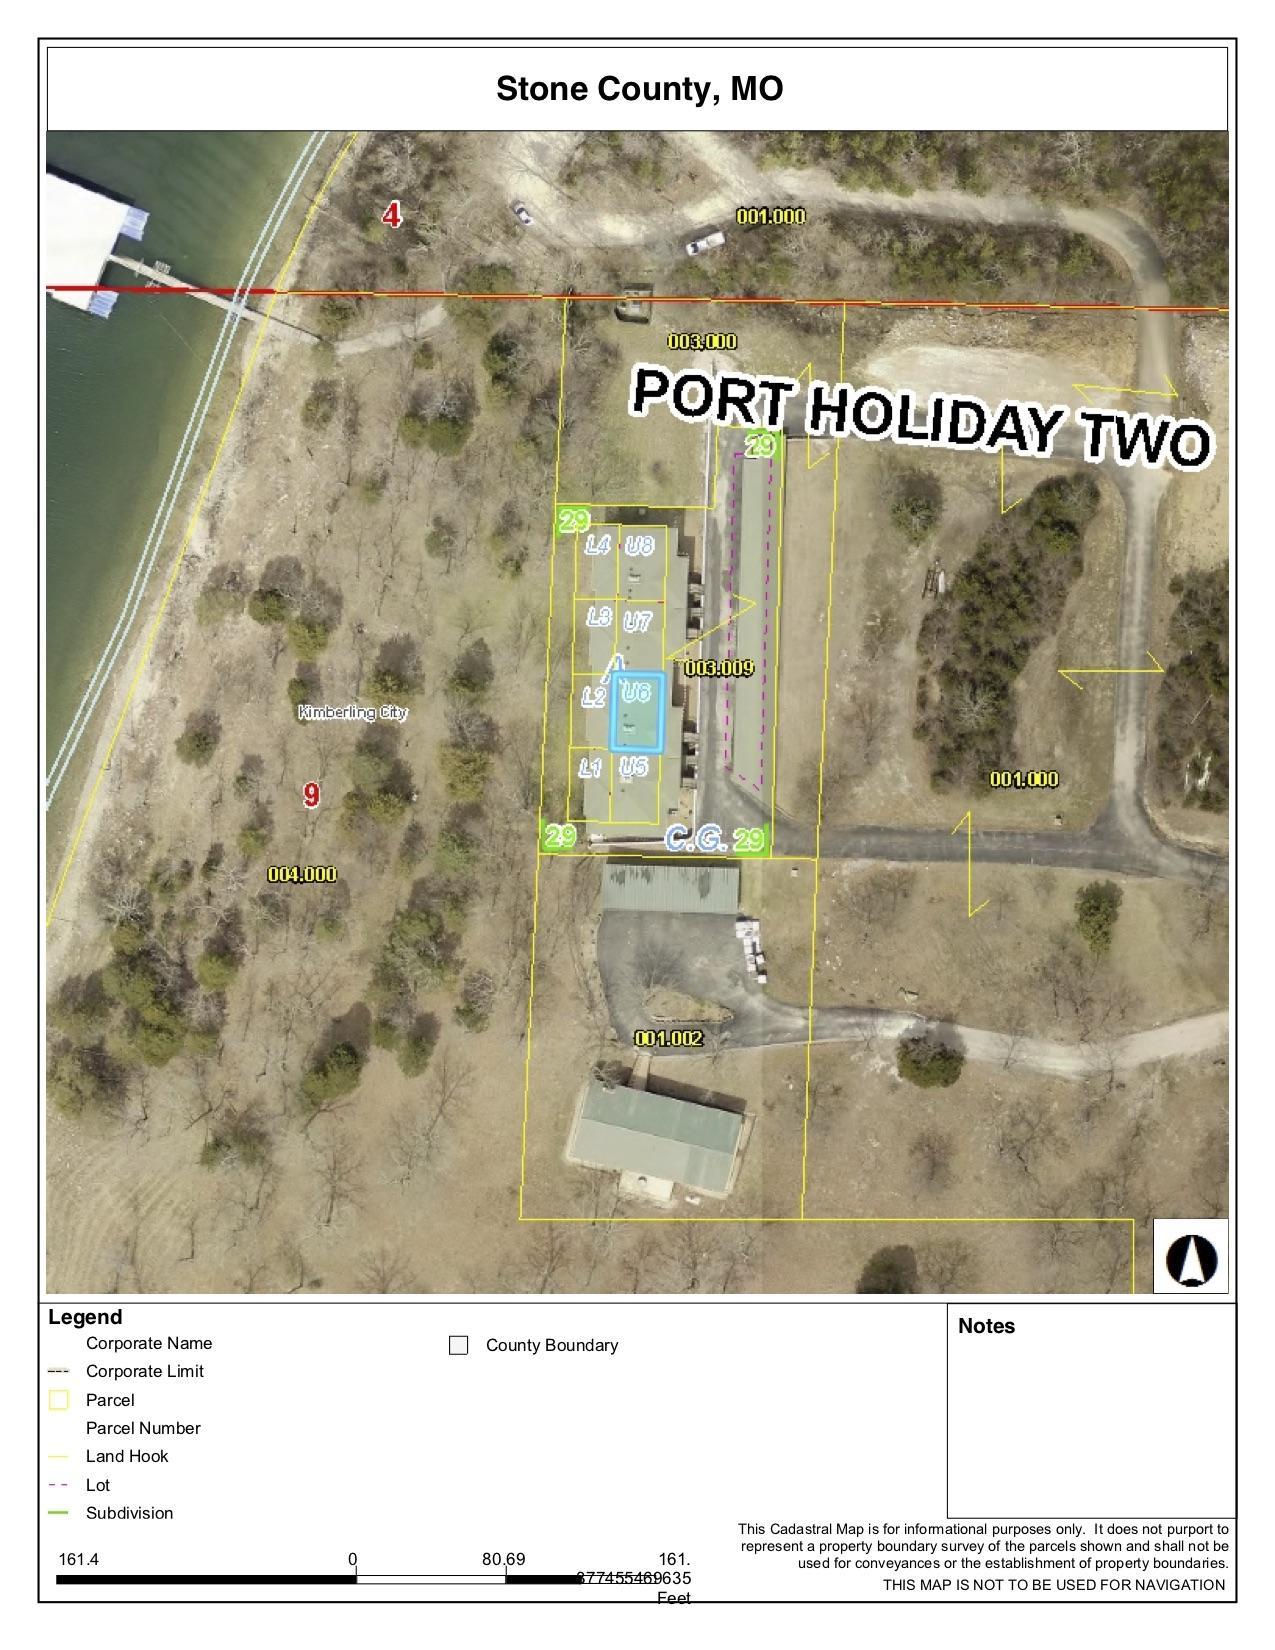 312 Port Holiday Two Lane Kimberling City, MO 65686